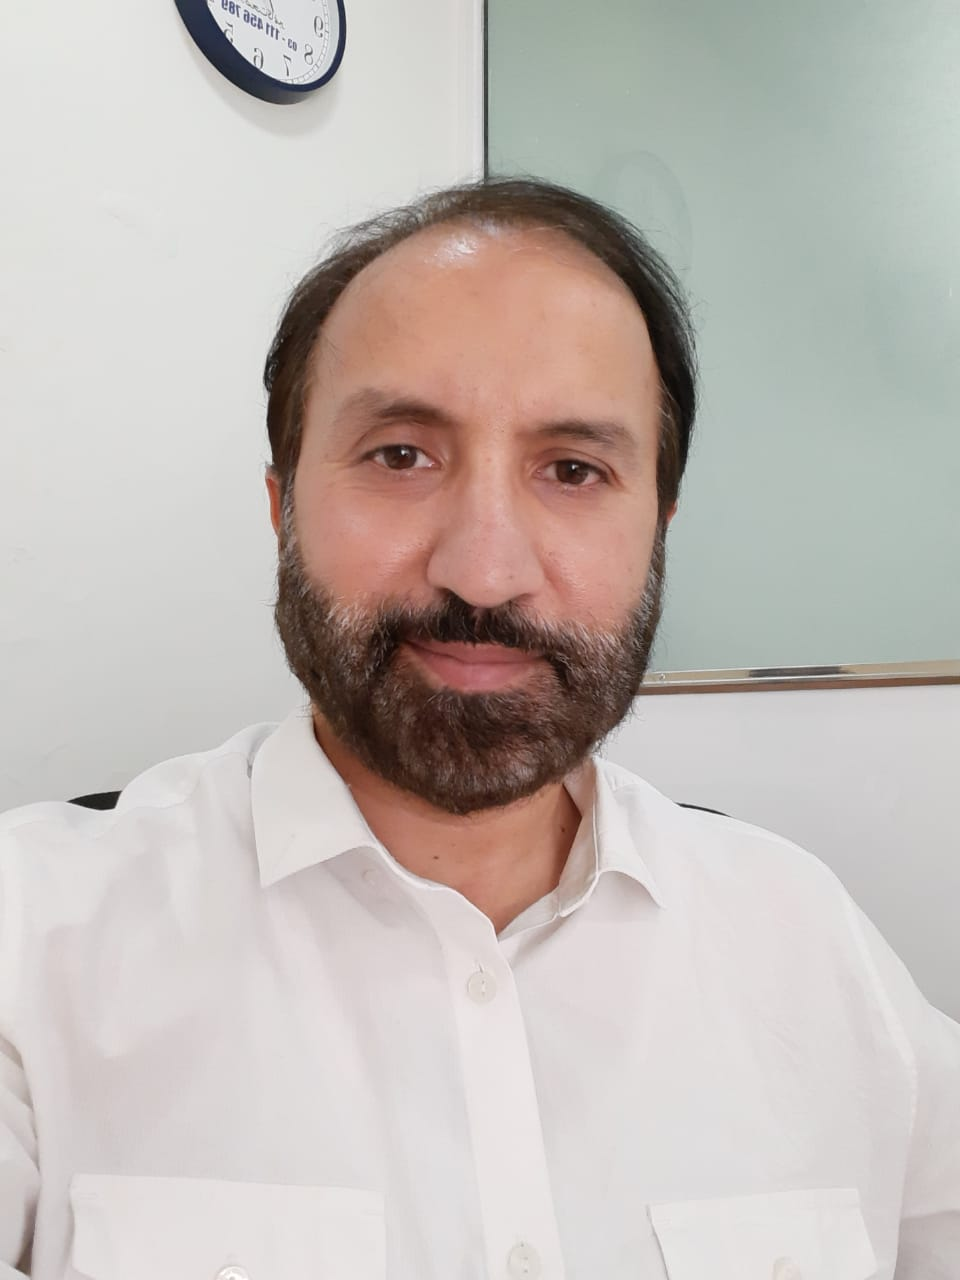 Dr. Athar Adnan Uppal